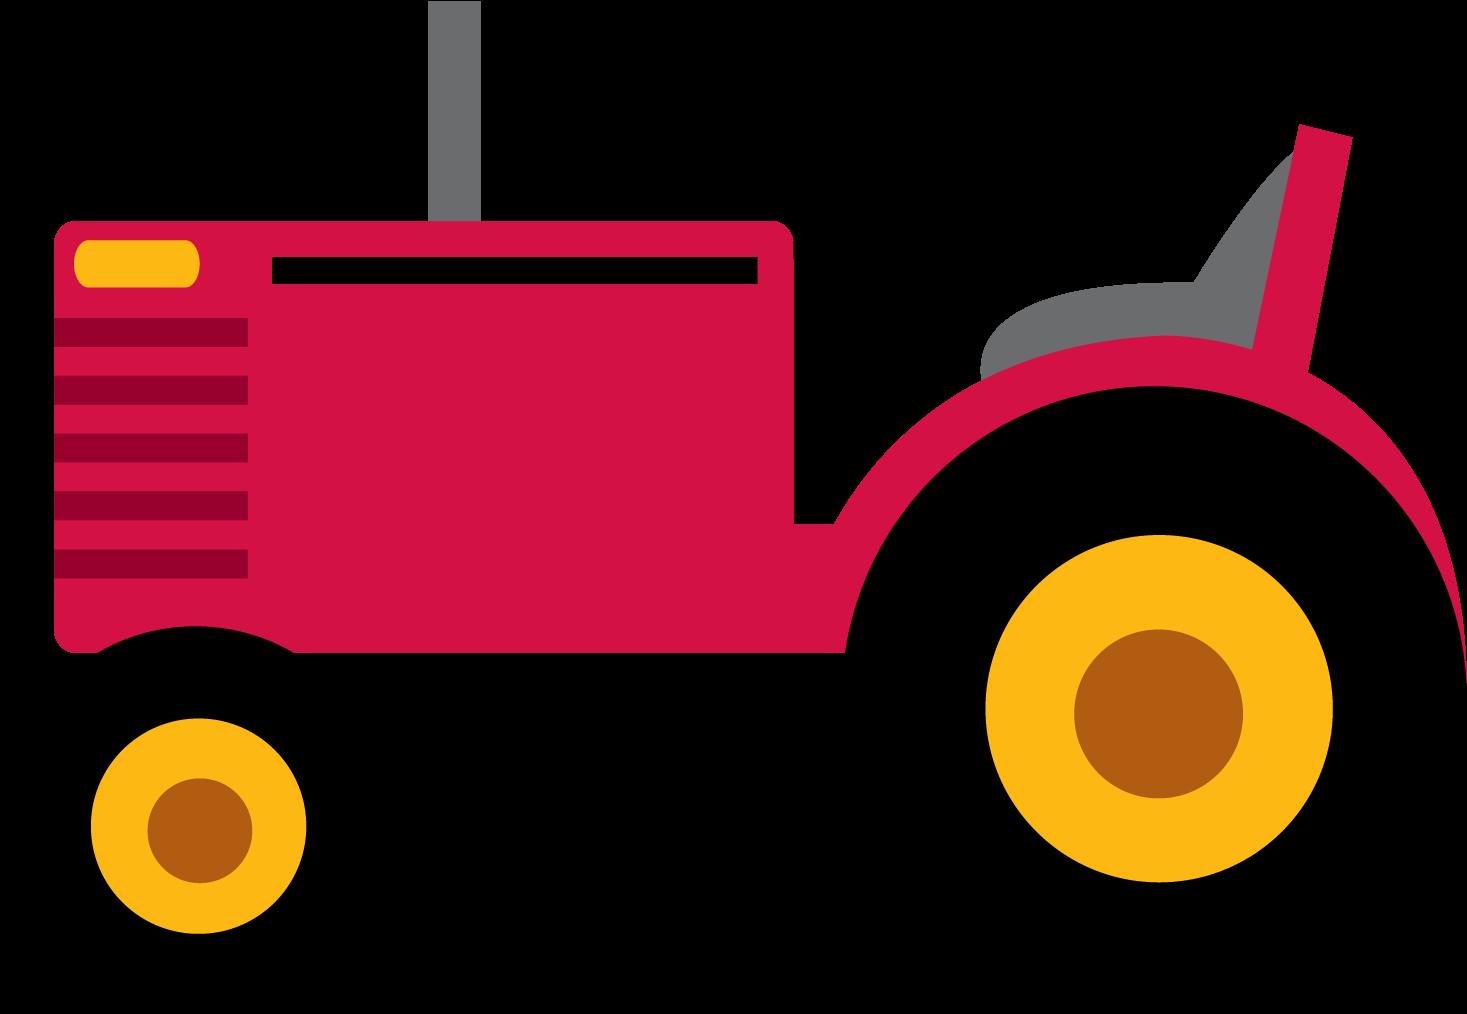 Transparent tractor clip art - Photo By @daniellemoraesfalcao - Clipart Tractor Png